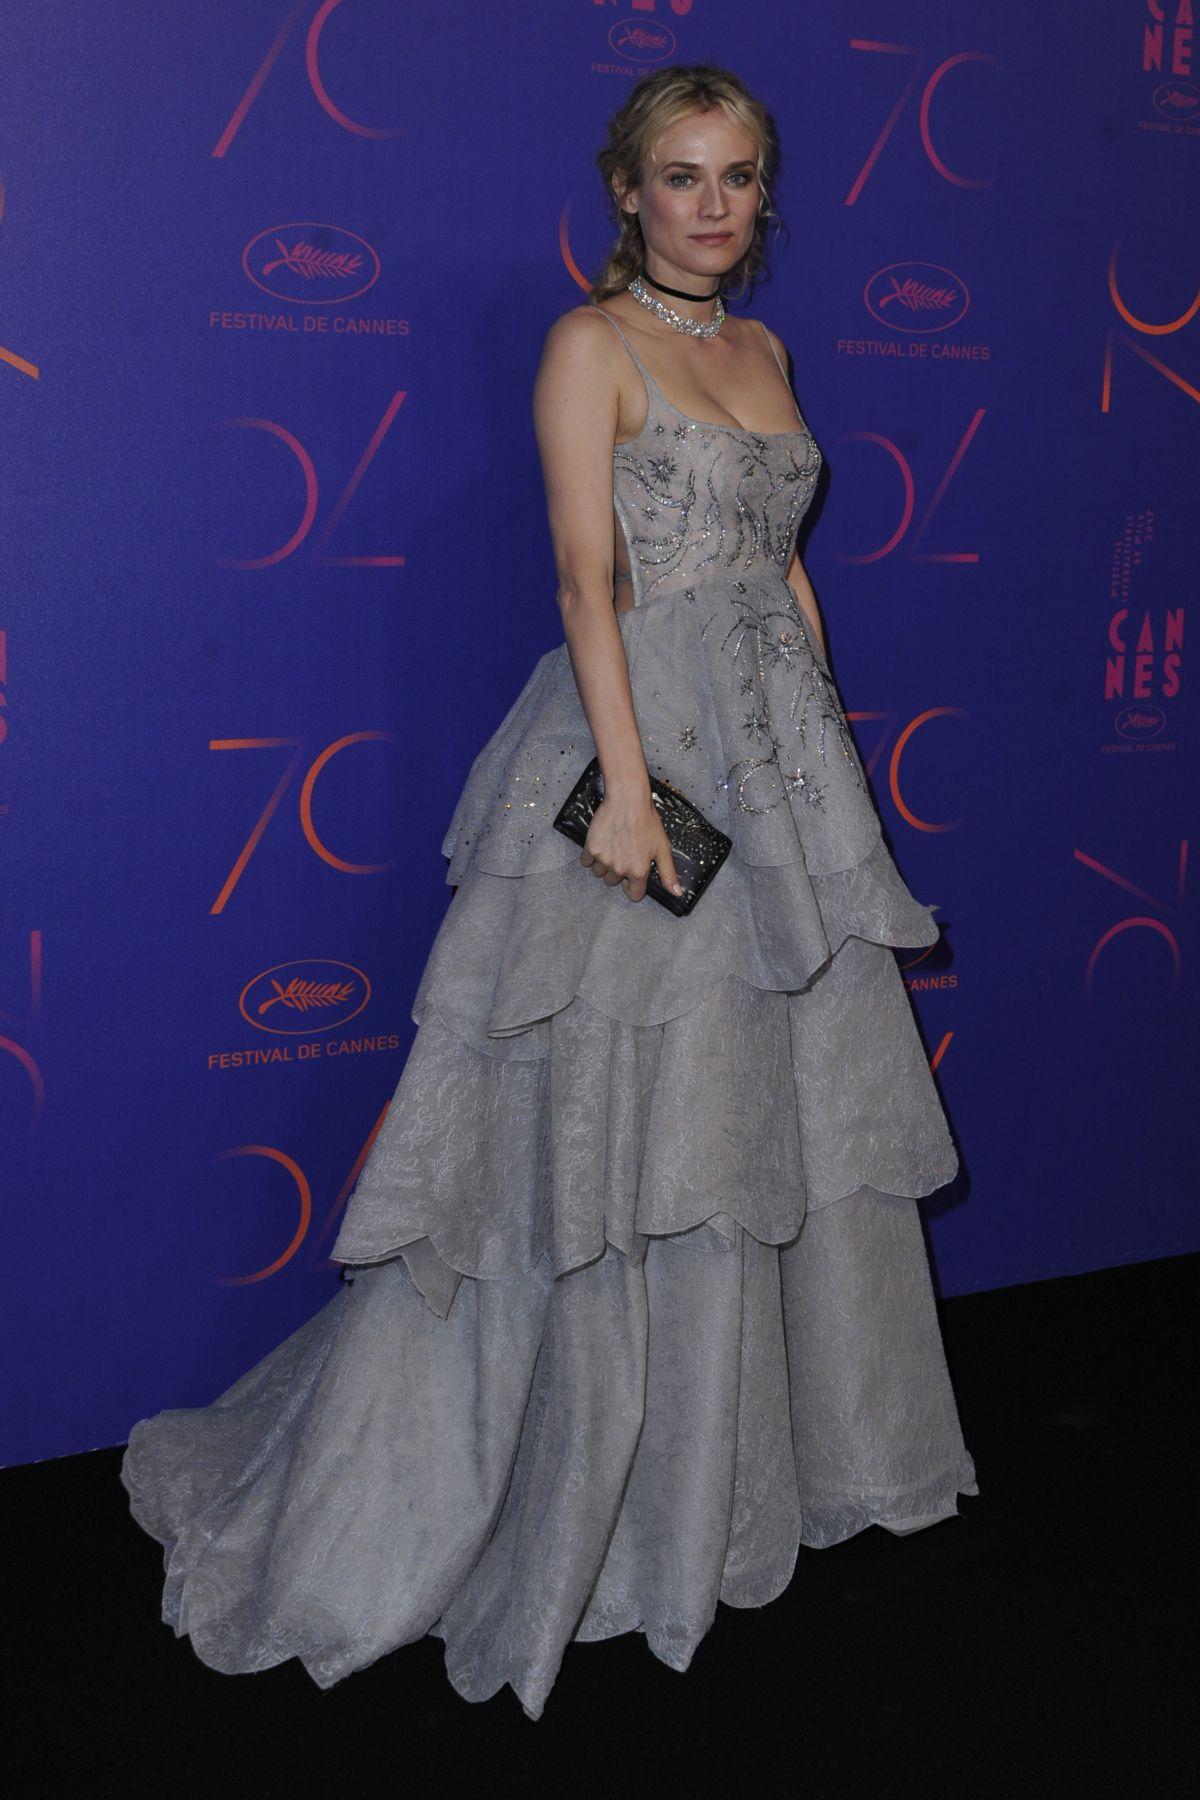 DIANE KRUGER at Cannes Film Festival 70th Anniversary Dinner 05/23/2017